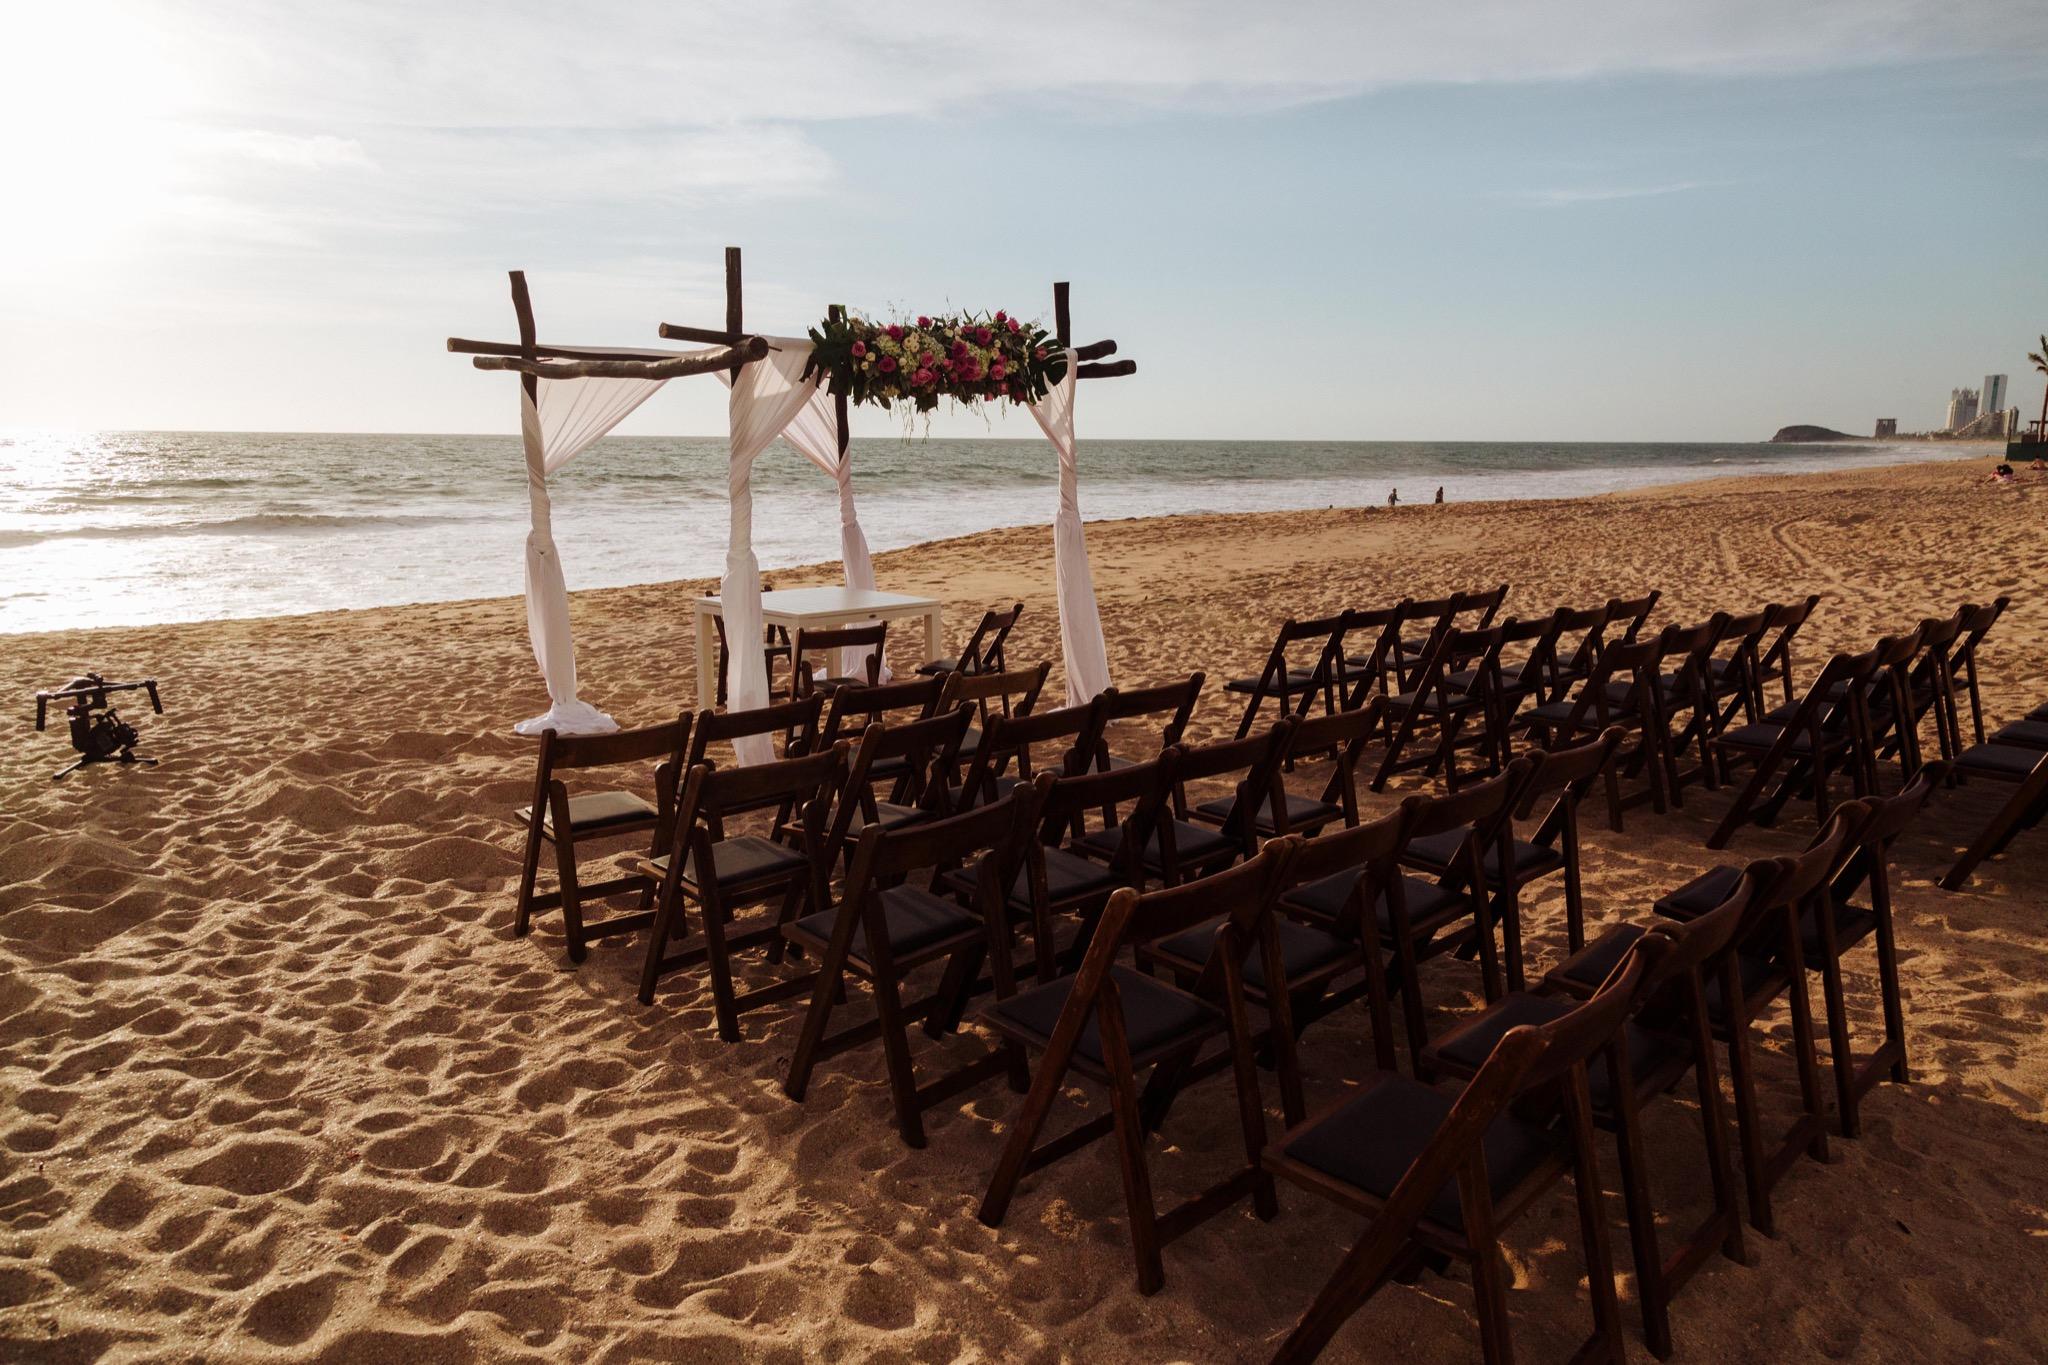 Javier_noriega_fotografo_bodas_profesional_zacatecas_mexico_mazatlan_sinaloa_photographer_weddings40